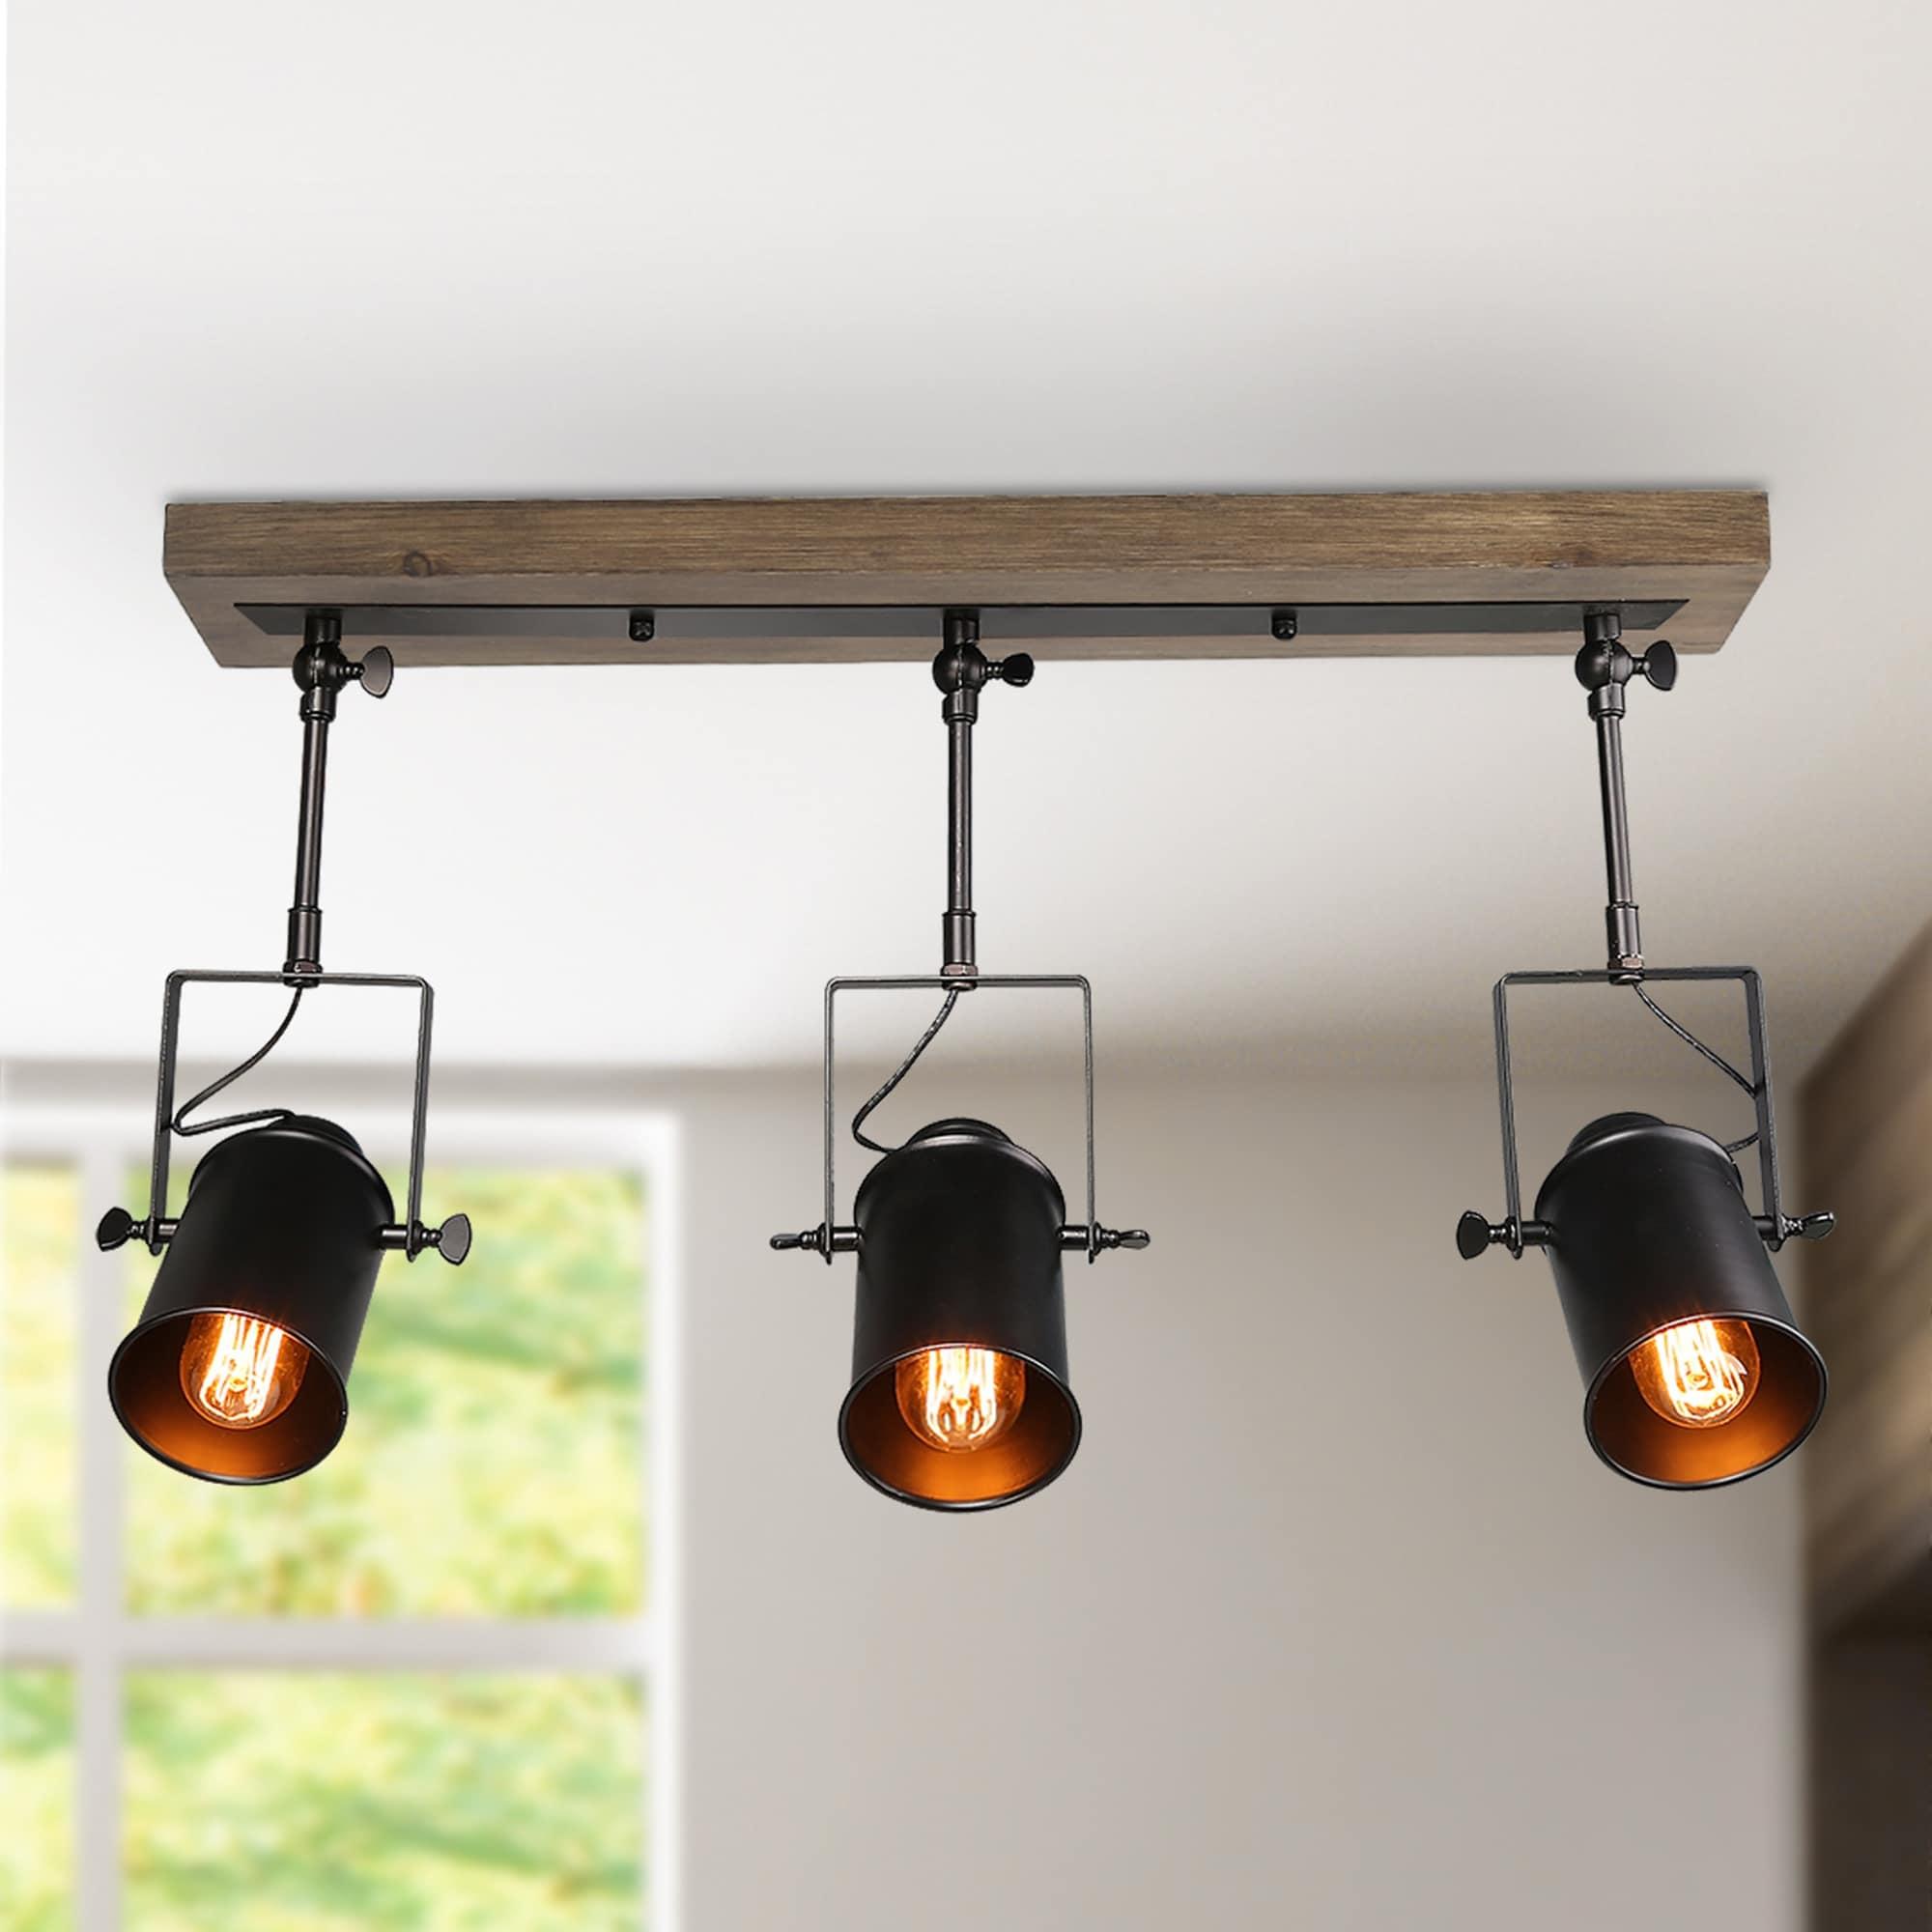 Lnc Modern Farmhouse Wood Track Lighting Spotlights 3 Lights Ceiling Light Fixture 24 8 X 4 7 X 15 3 On Sale Overstock 20307485